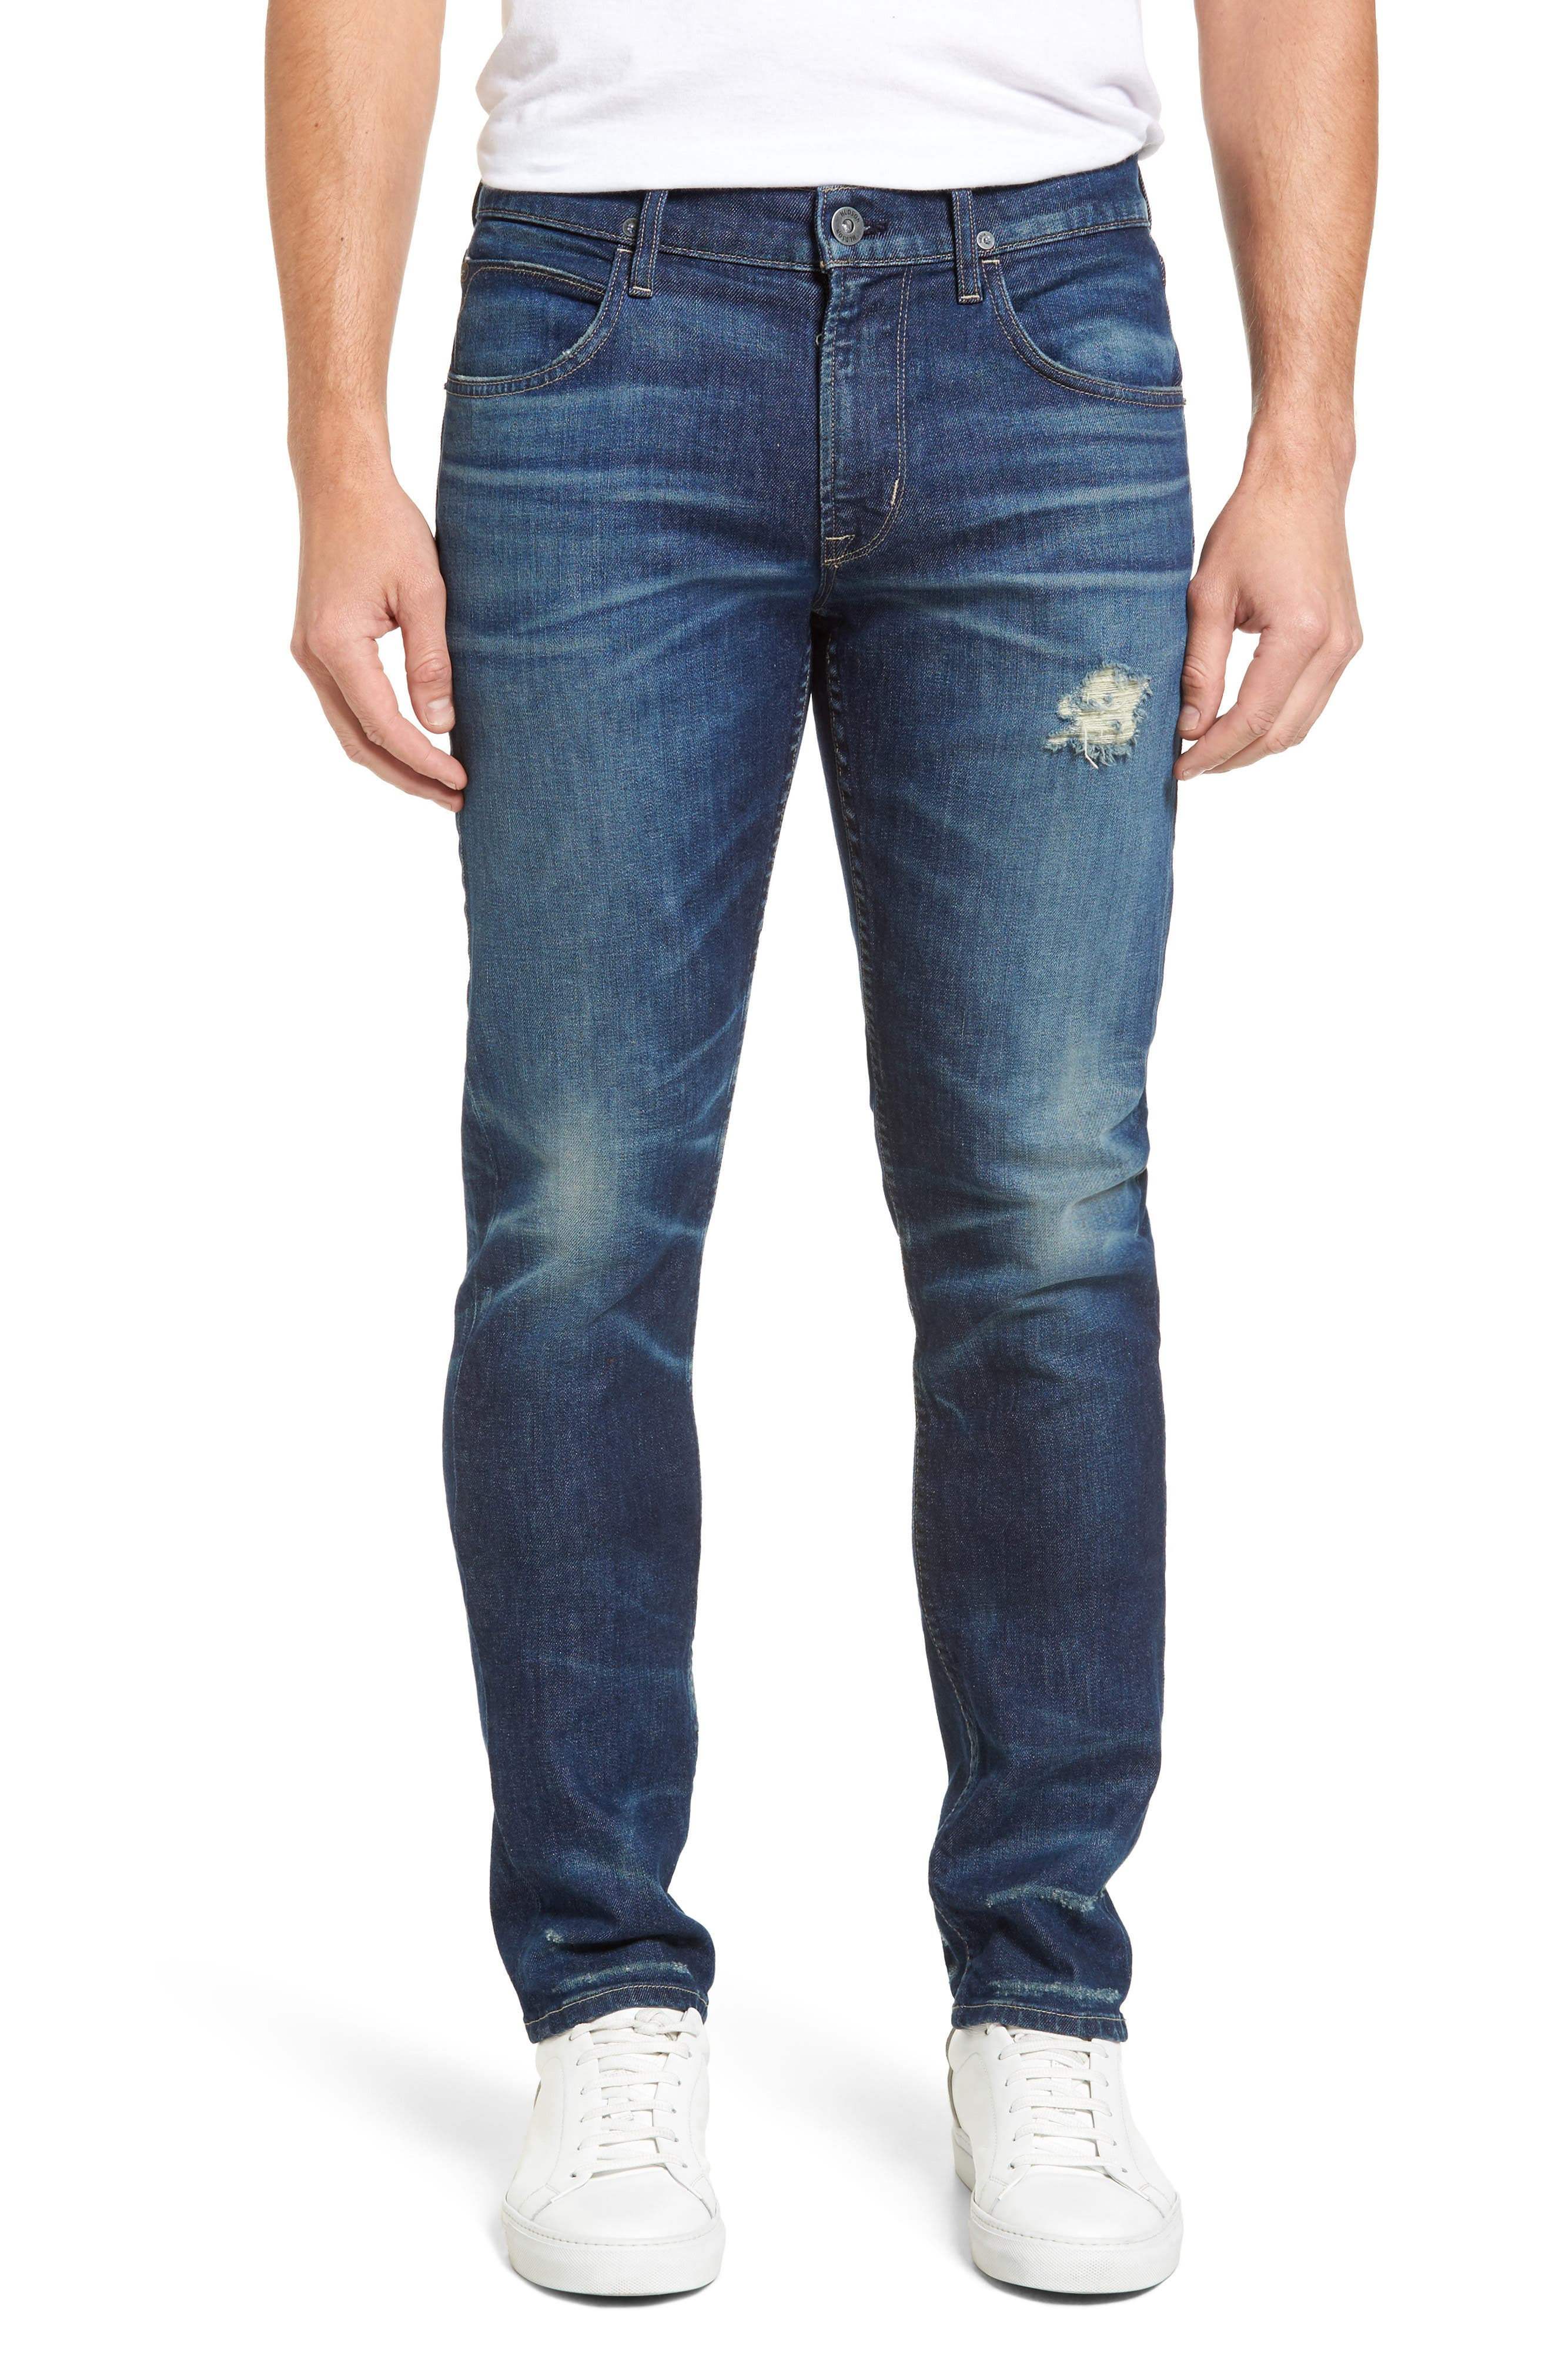 Blake Slim Fit Jeans,                             Main thumbnail 1, color,                             425